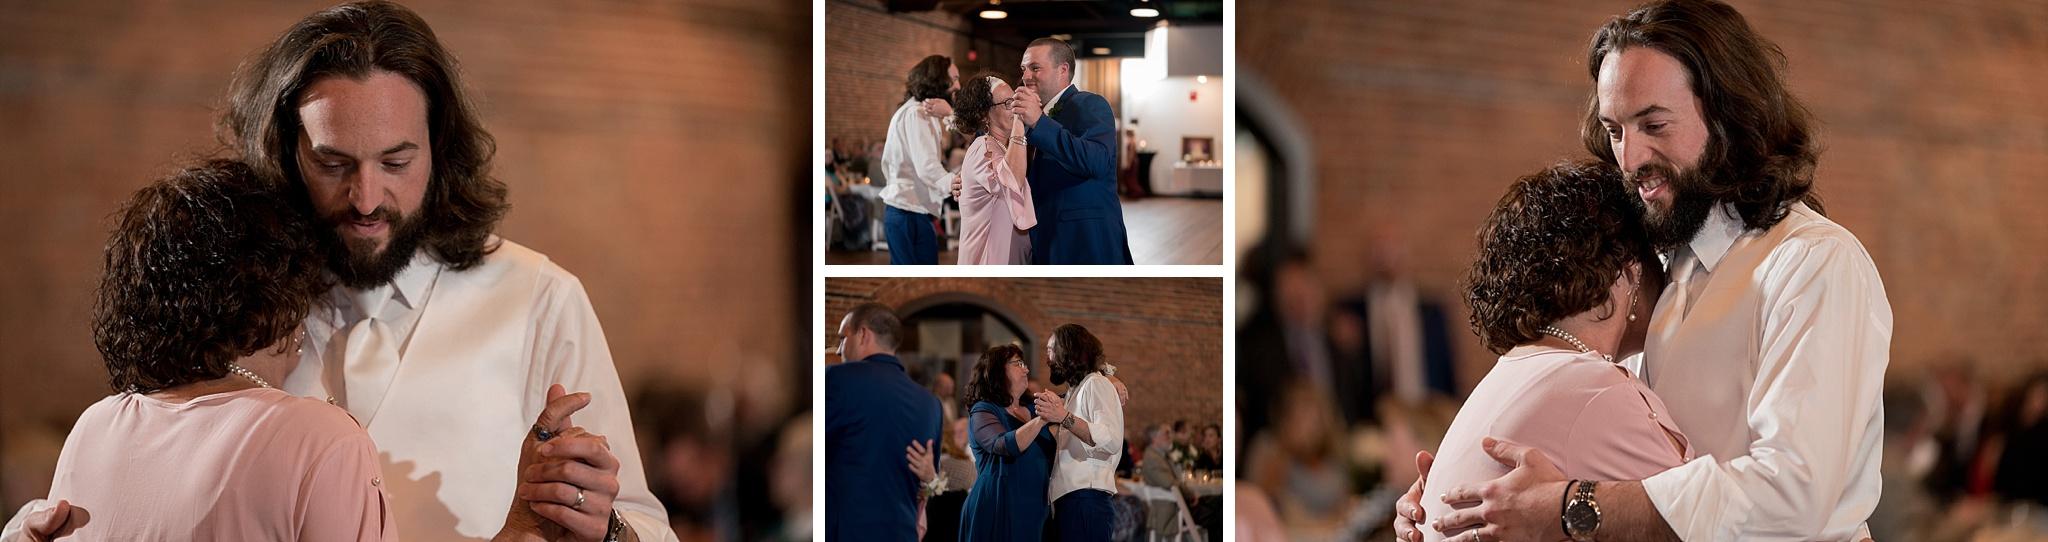 Washington-NC-Wedding-Photography-221.jpg